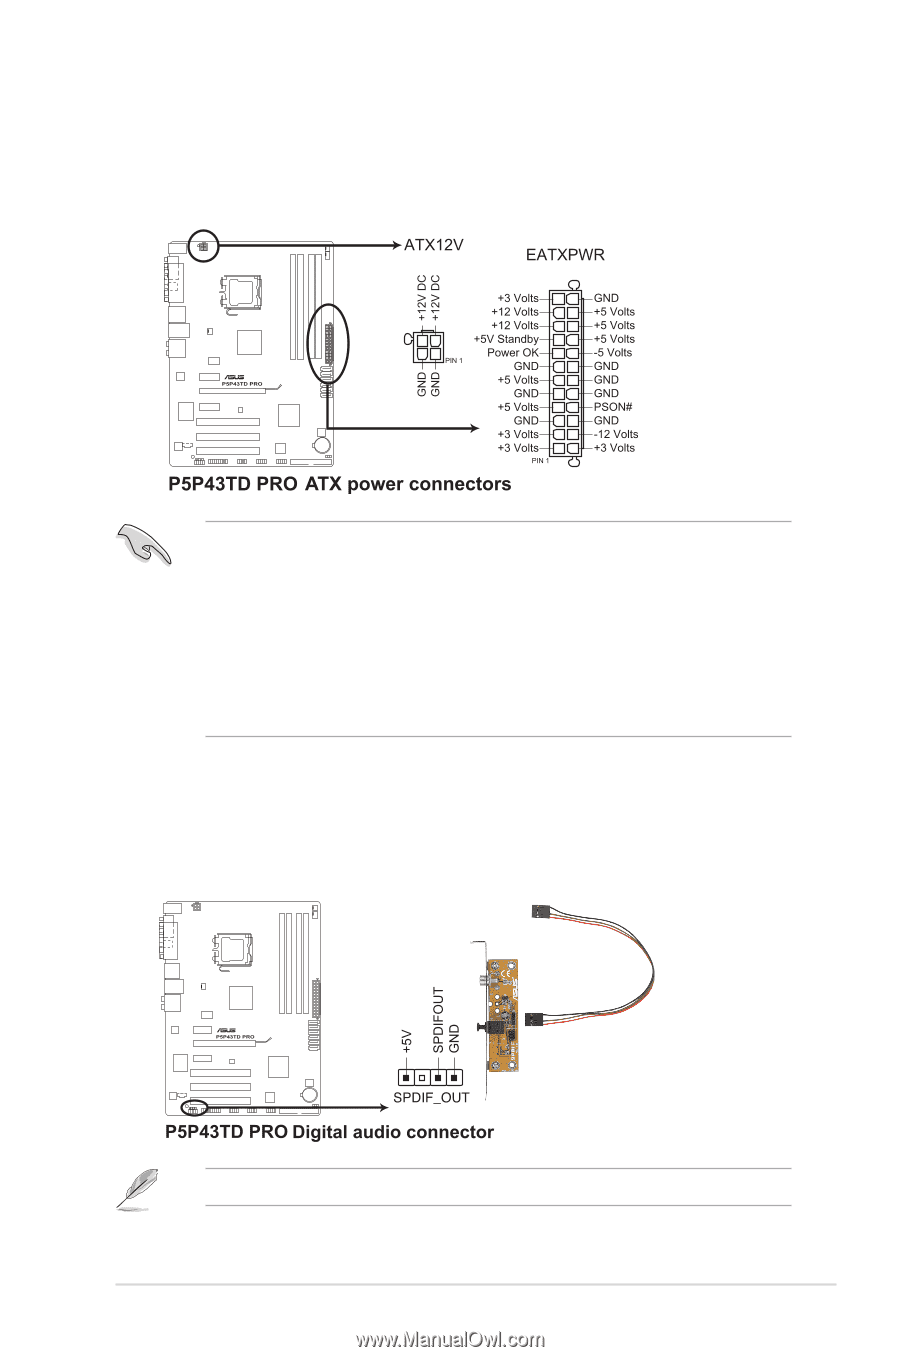 Asus P5P43TD PRO | User Manual - Page 37